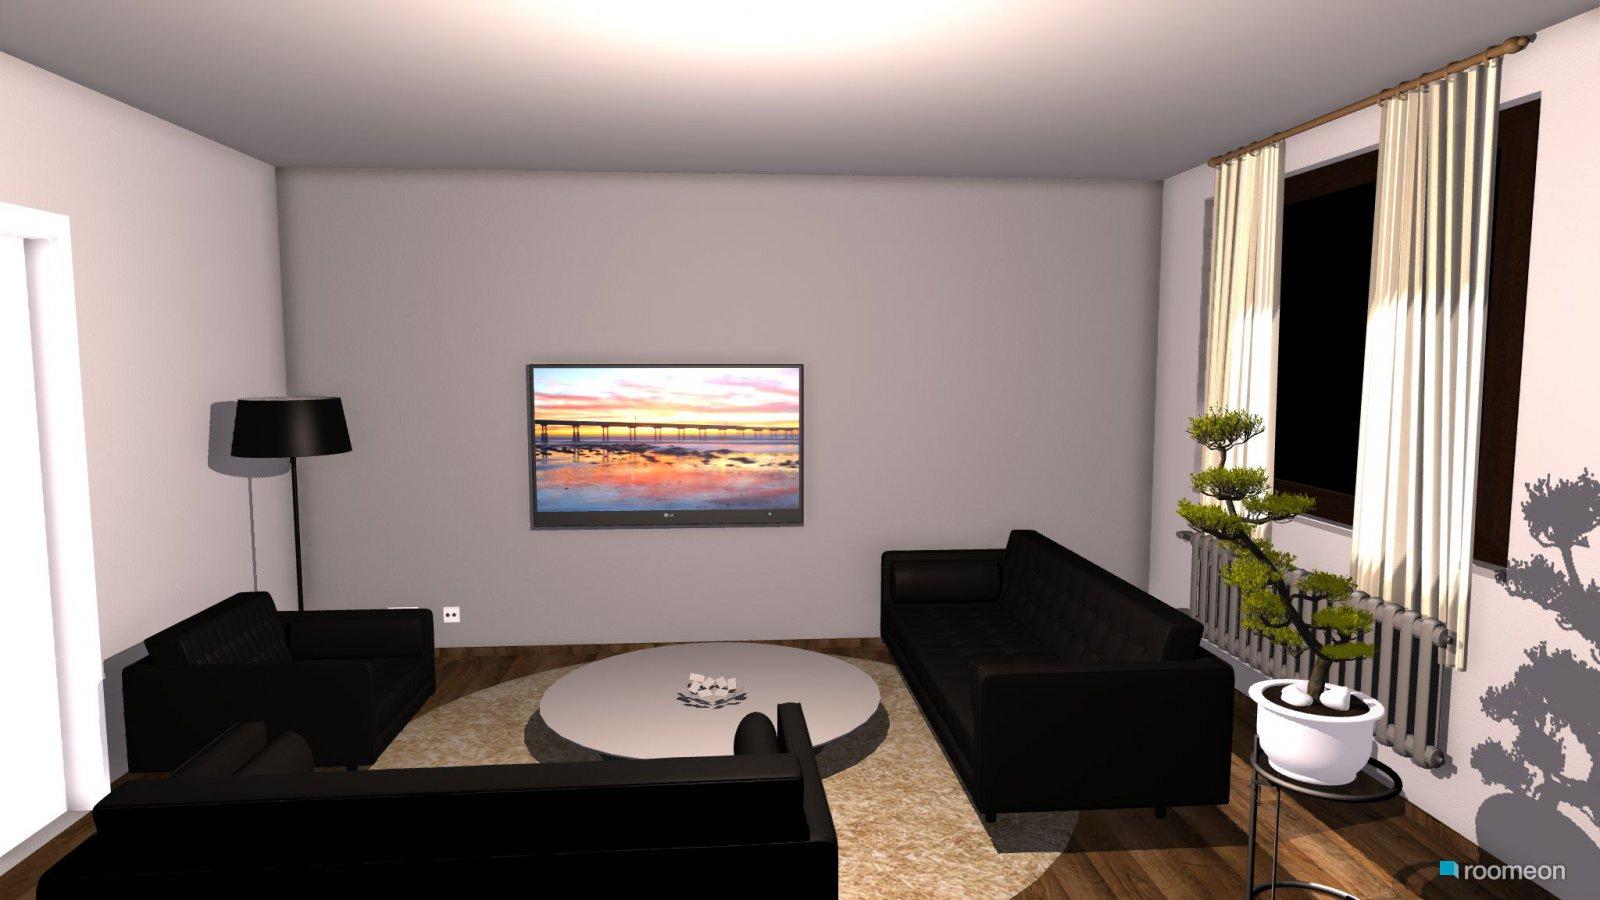 Raumplanung wohnzimmer weiße wand roomeon community deko ideen